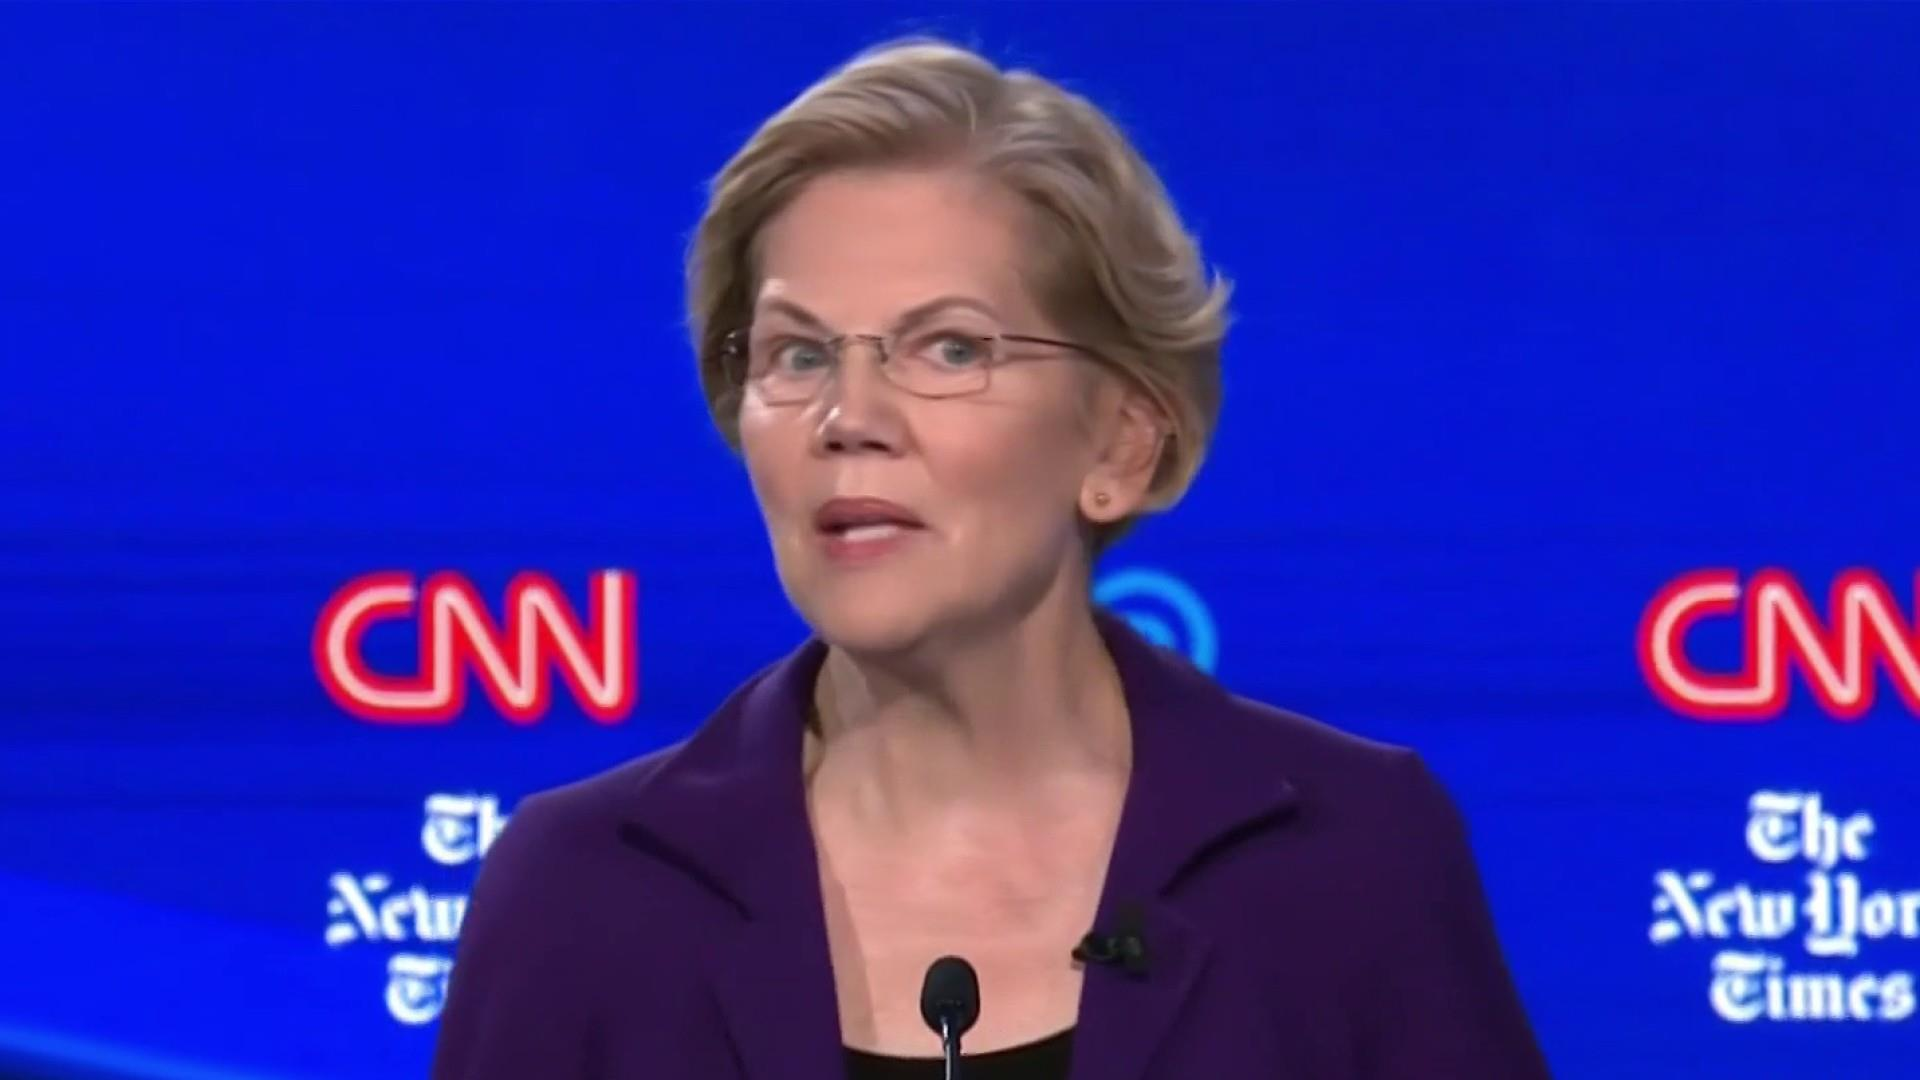 Elizabeth Warren gets the frontrunner treatment